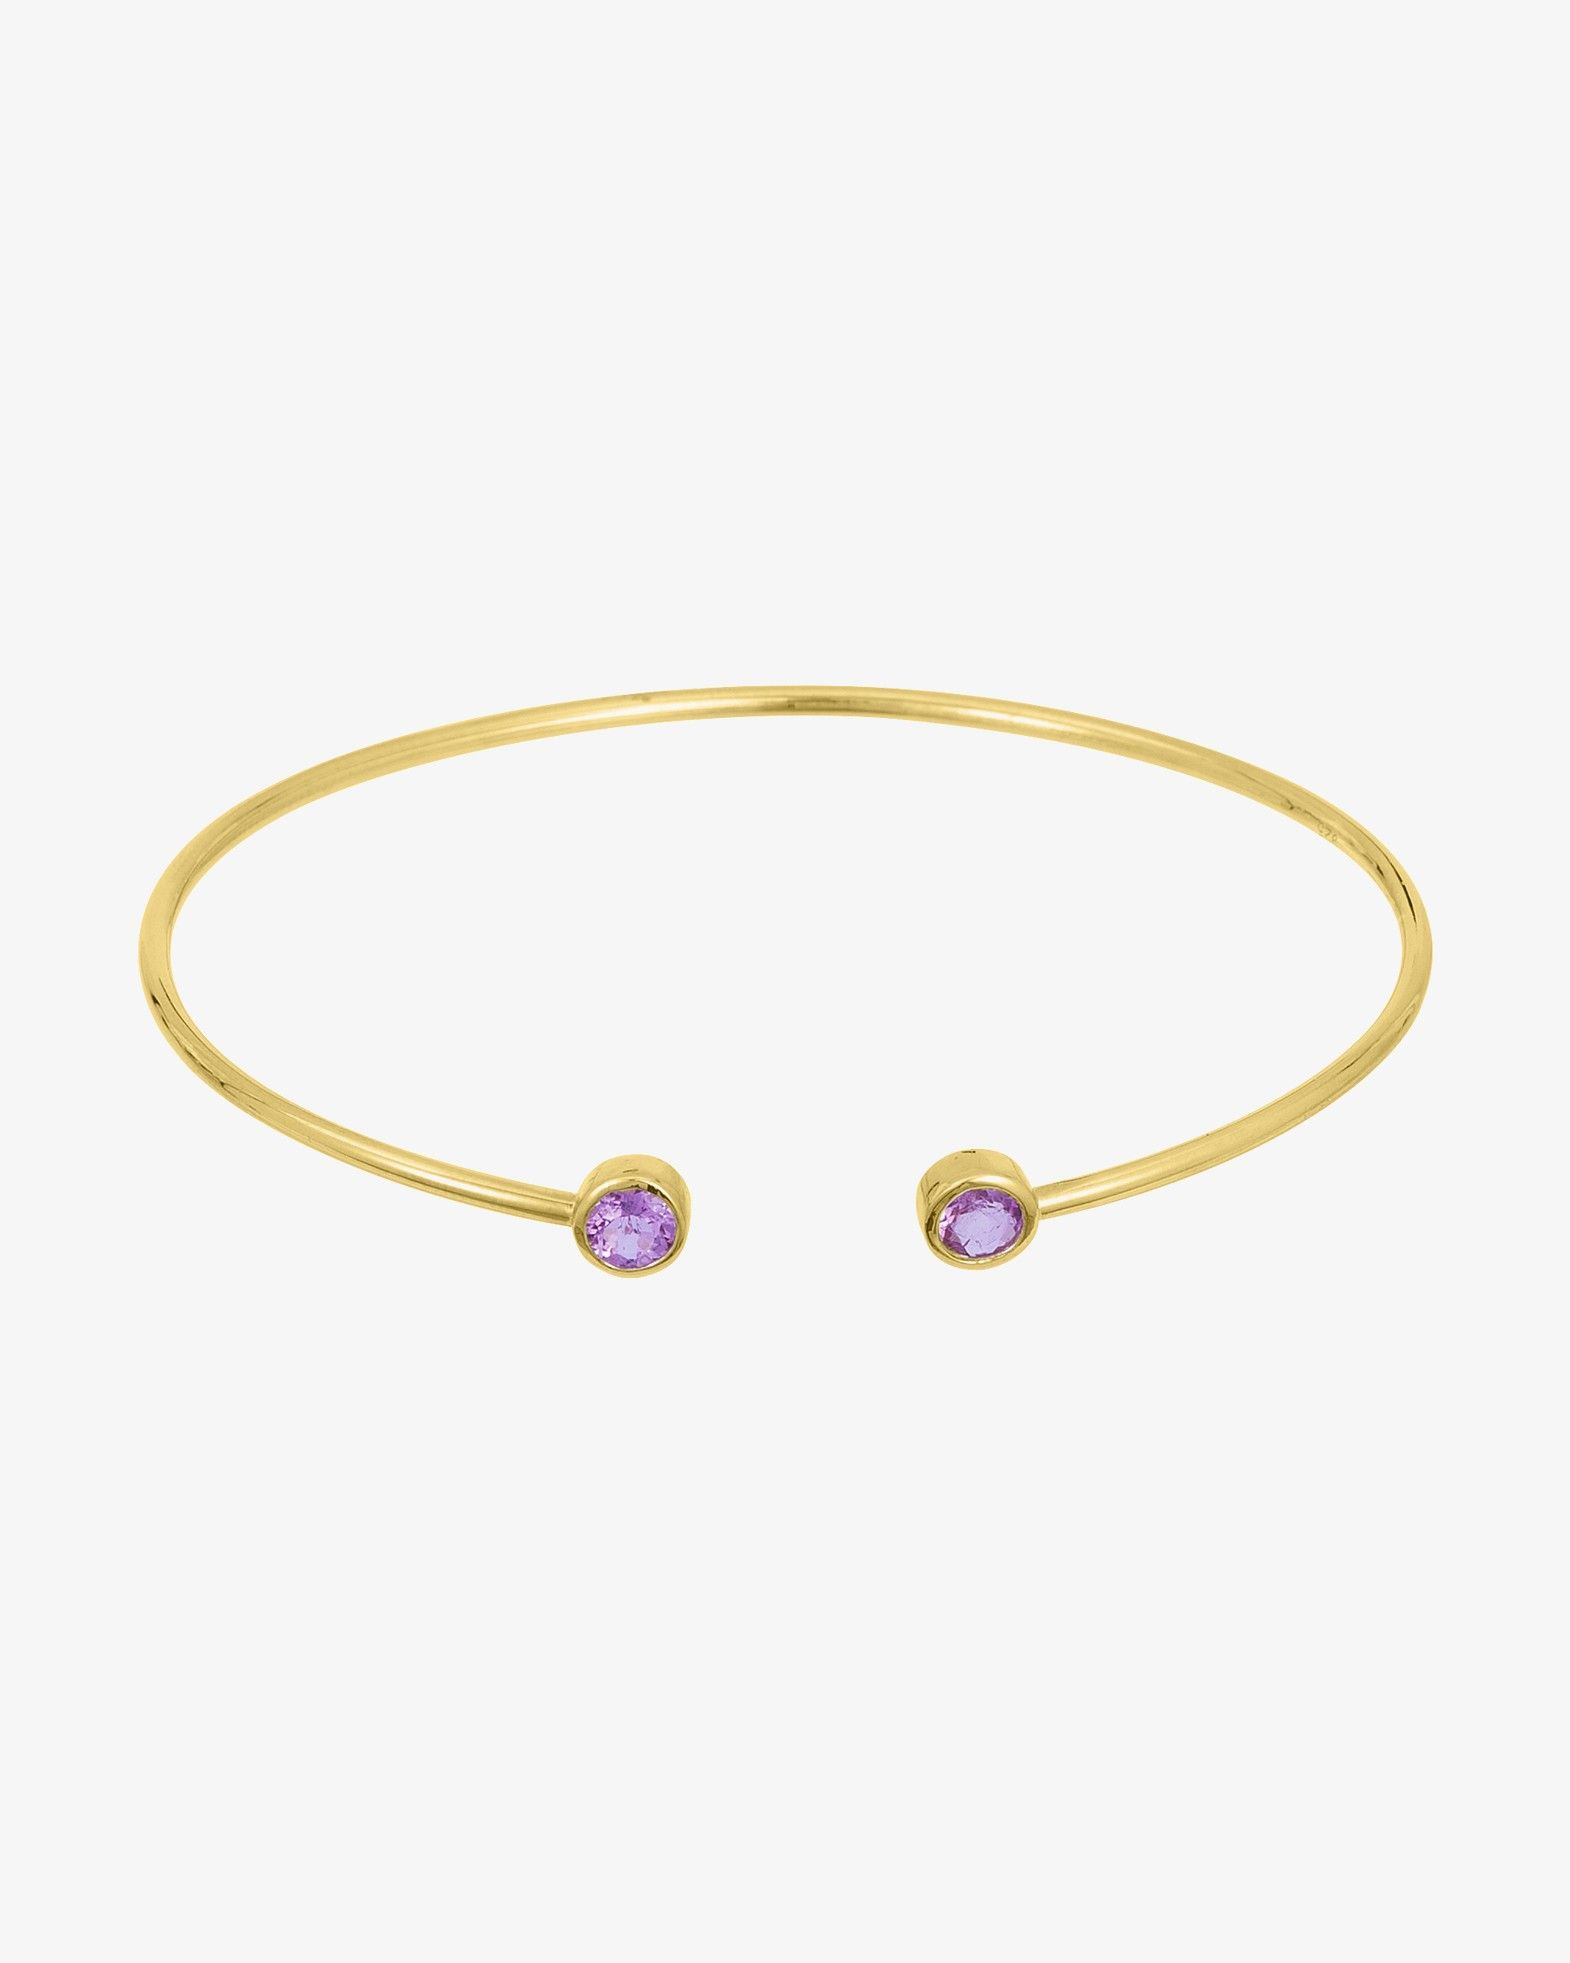 Shoppa smycken från Sophie by Sophie online – armband f8e119735fc33